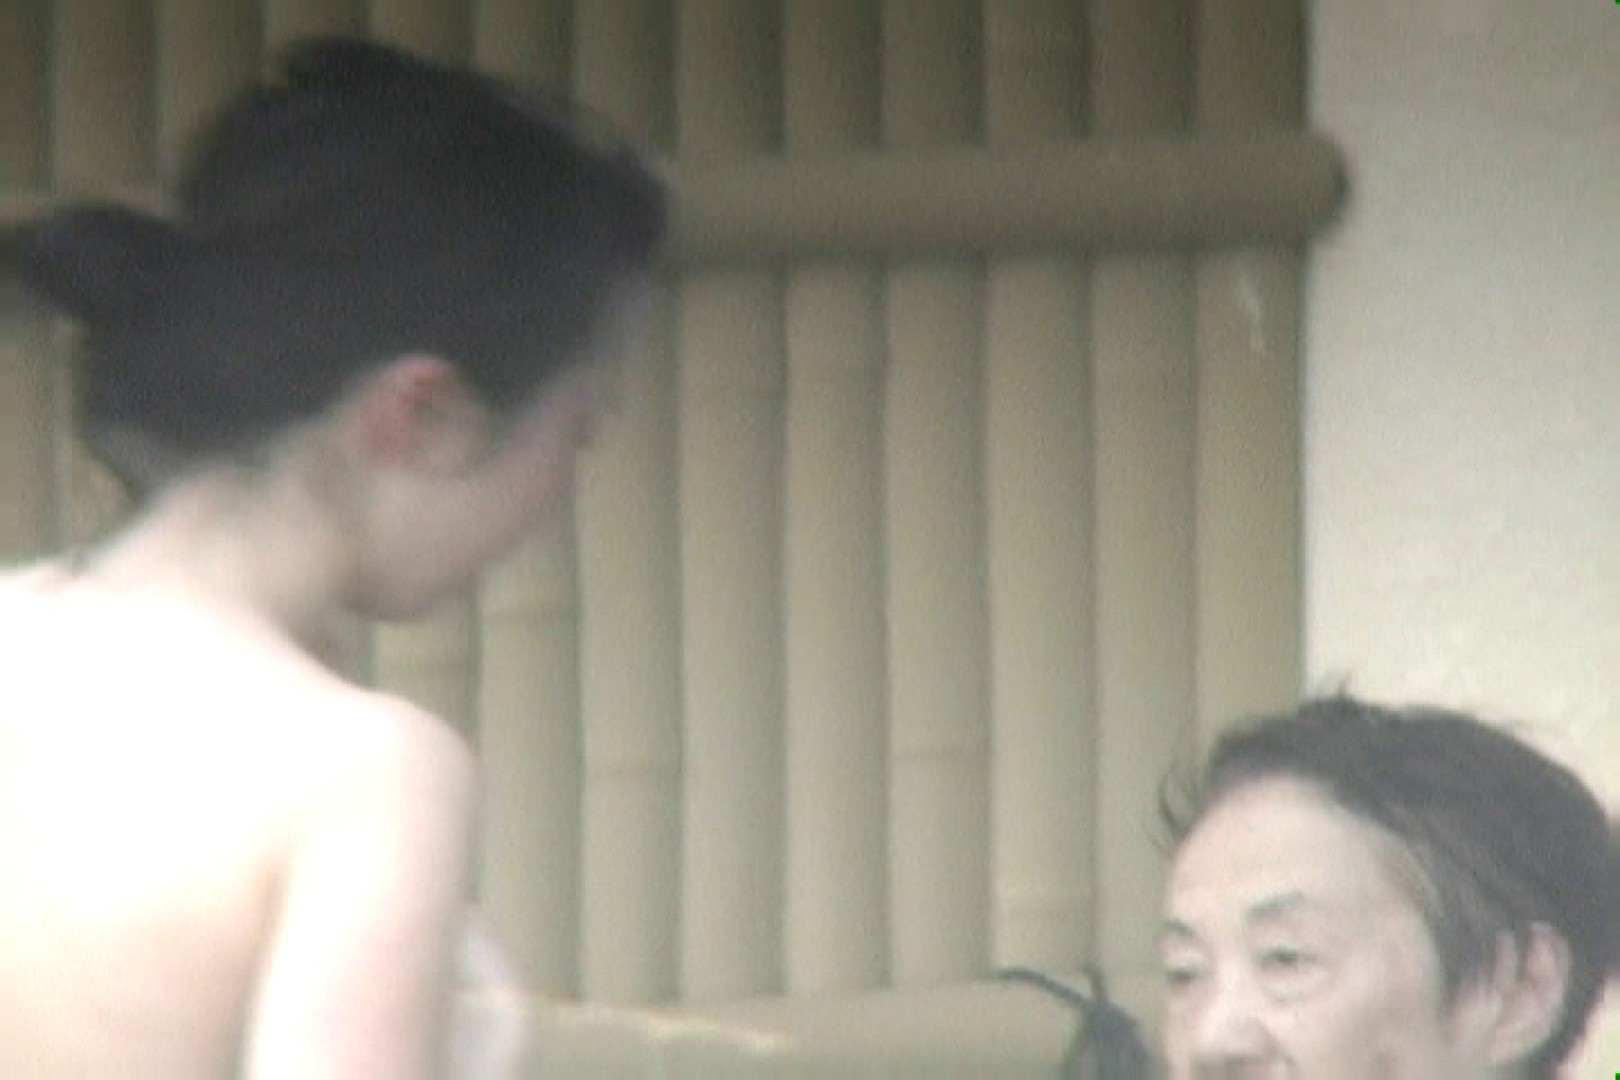 Aquaな露天風呂Vol.687 盗撮   OLセックス  63画像 7